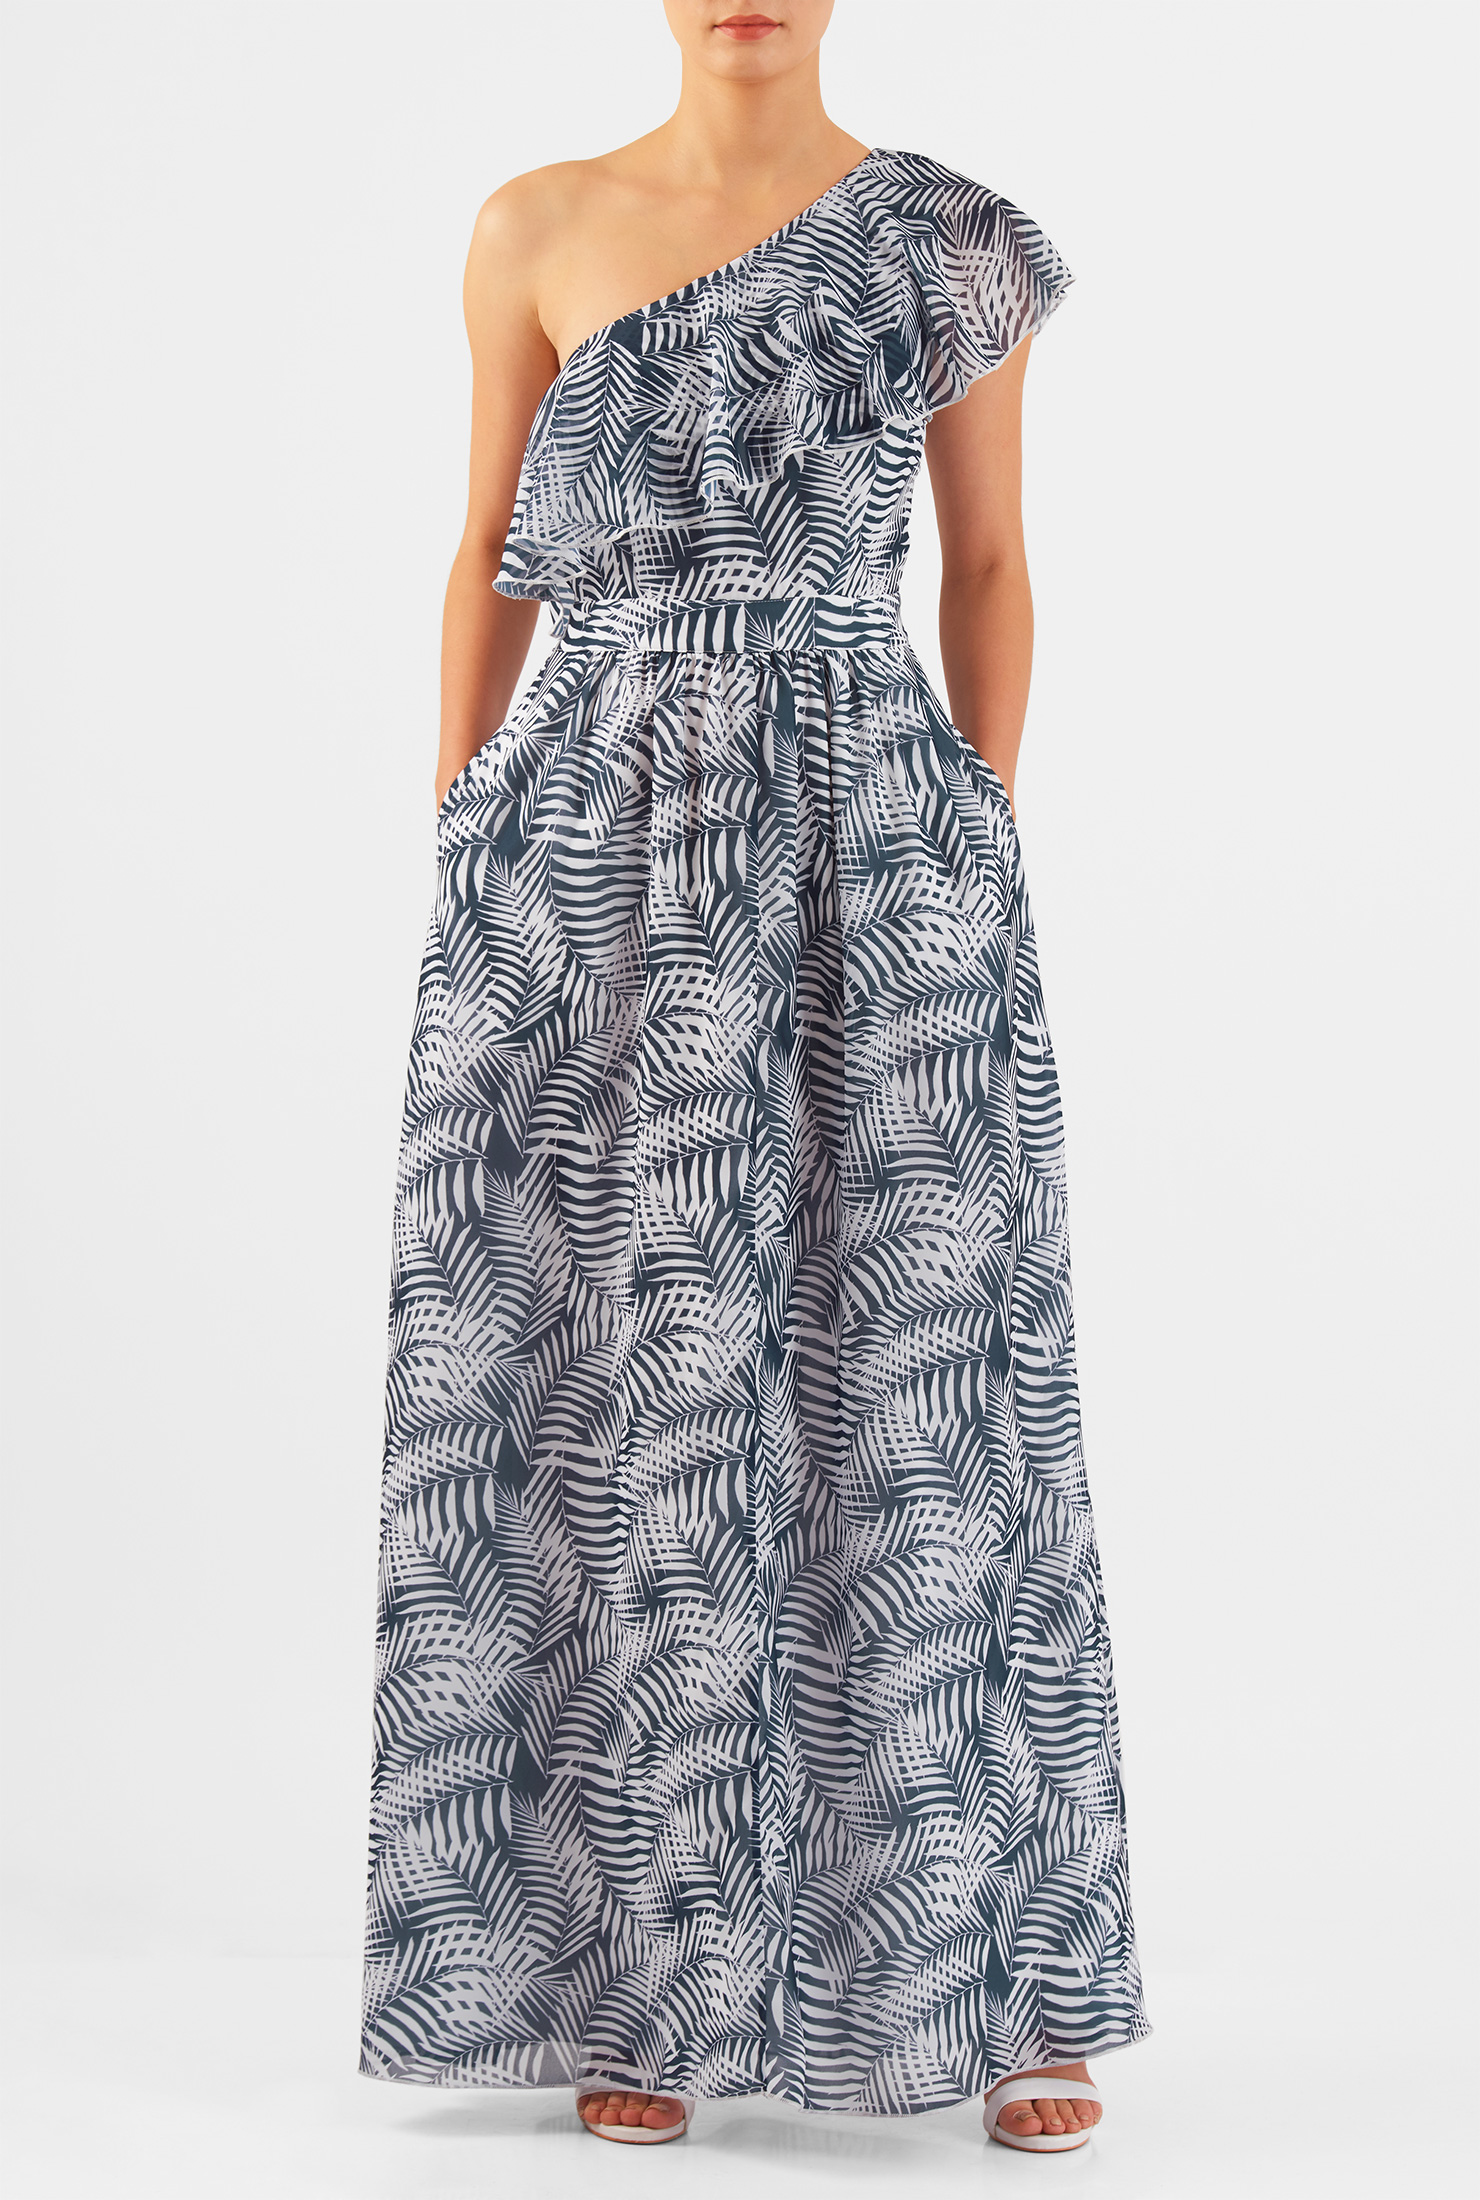 Eshakti Womens Ruffle One-shoulder Palm Print Georgette Maxi Dress